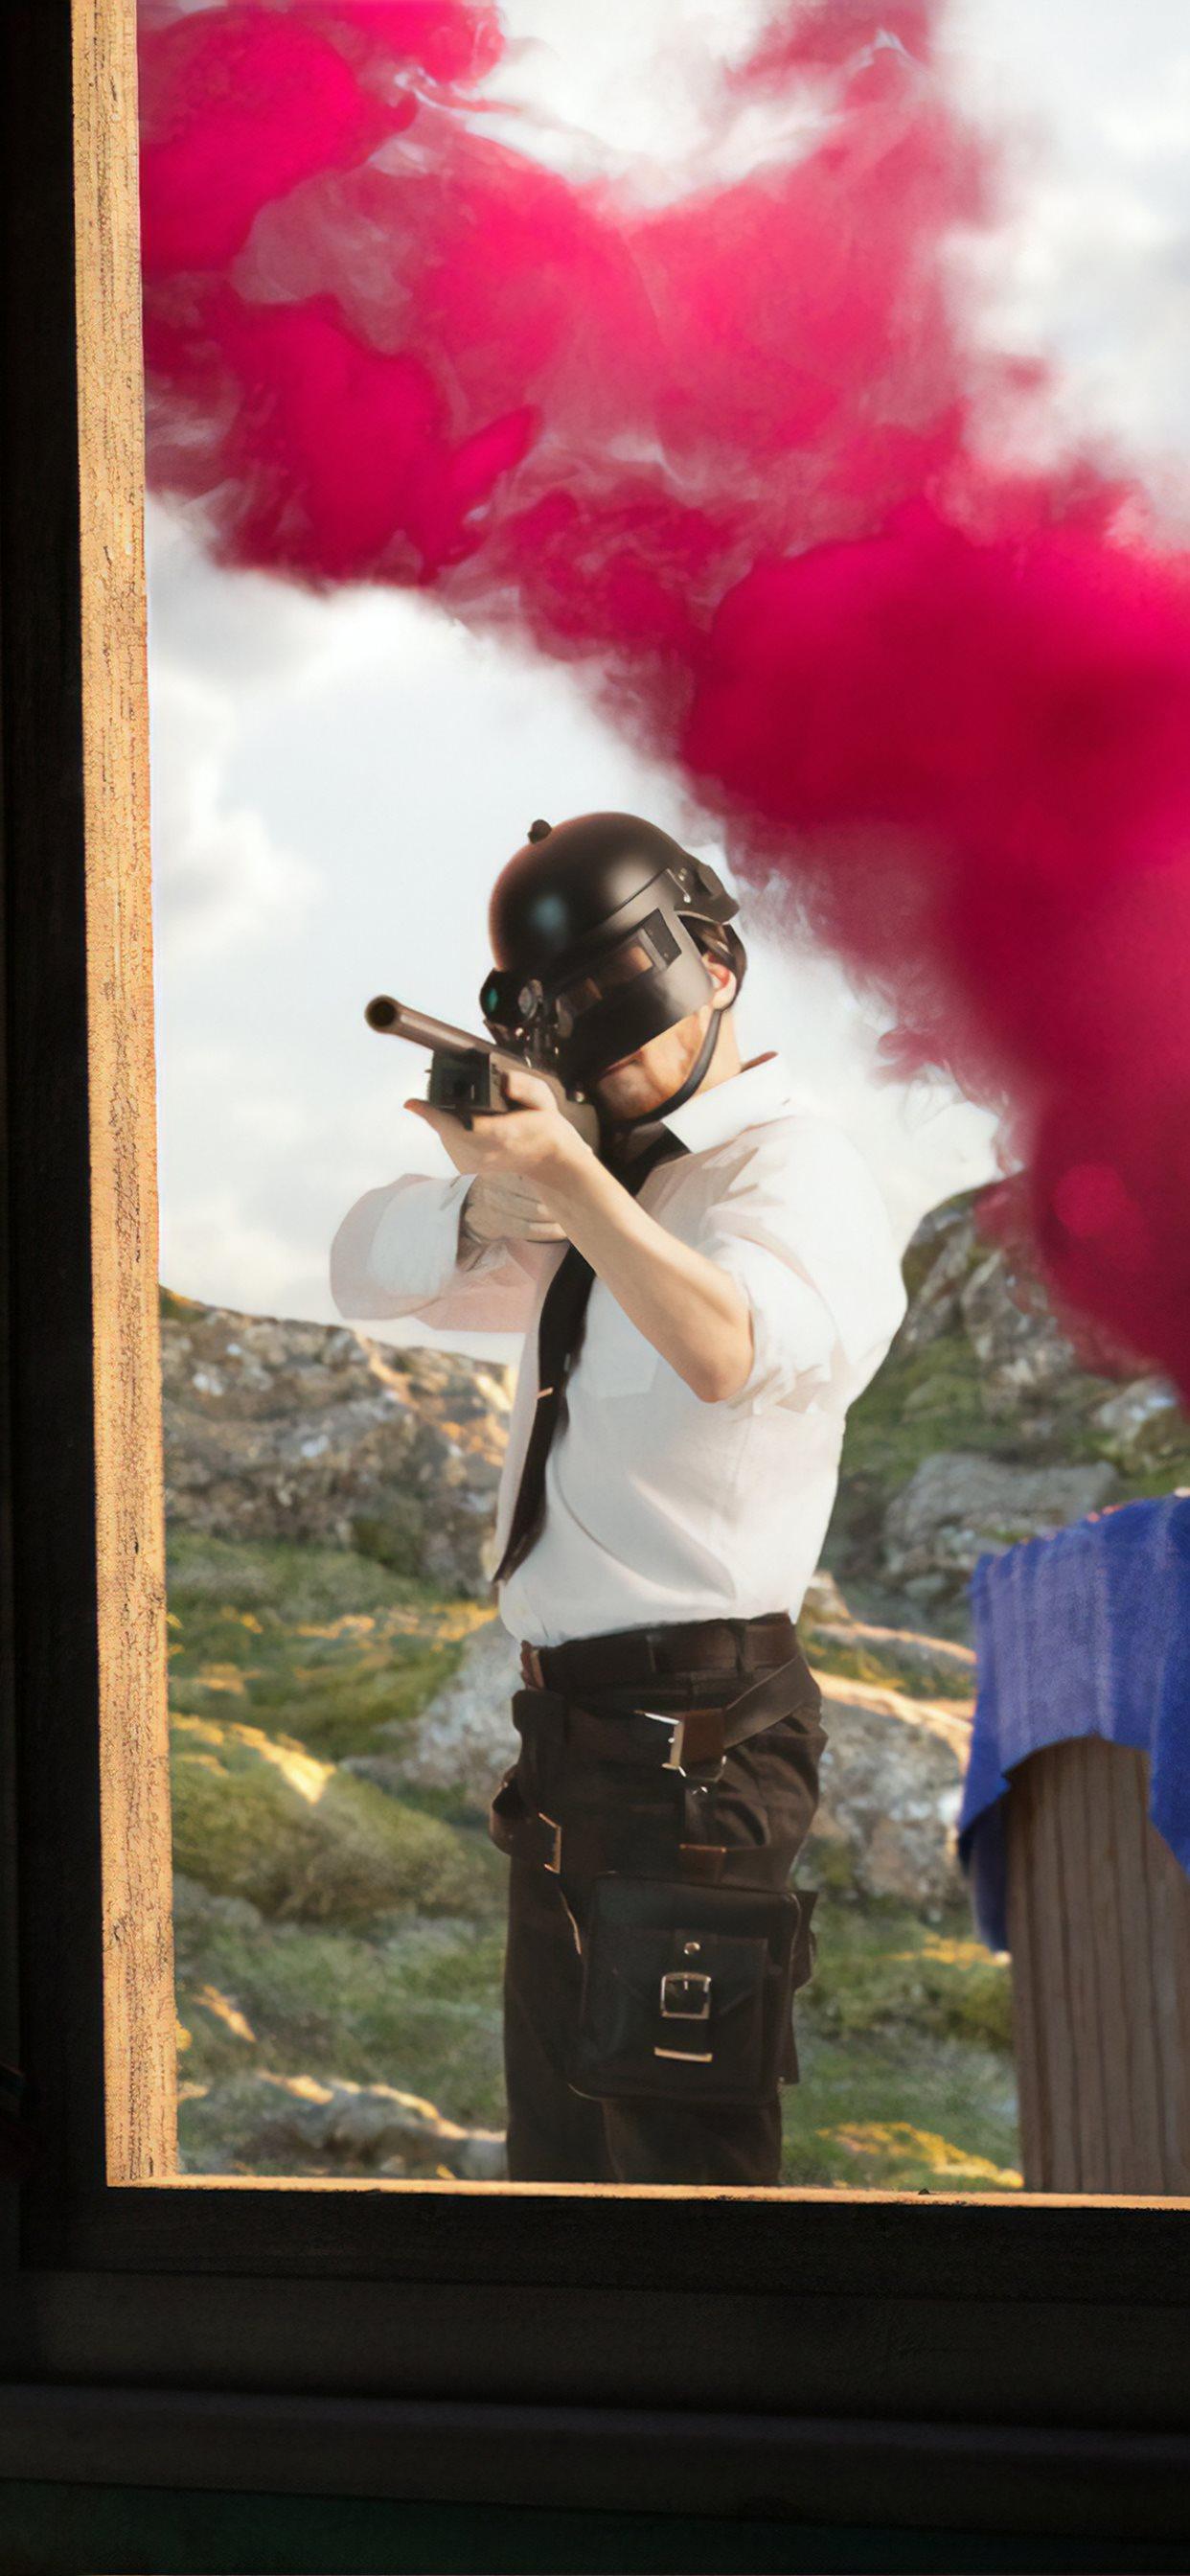 Pubg Shooting Range Iphone X Wallpapers Free Download